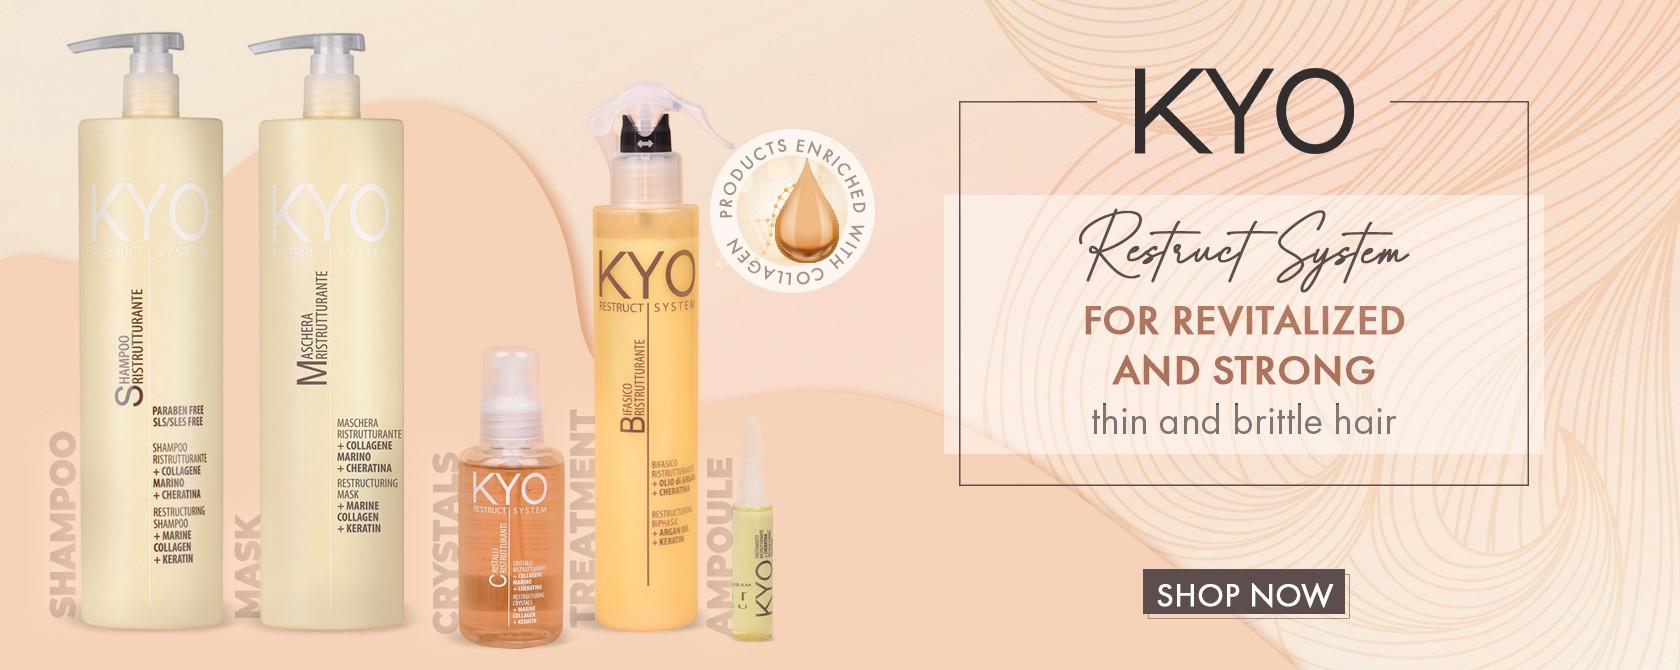 KYO Restruct System